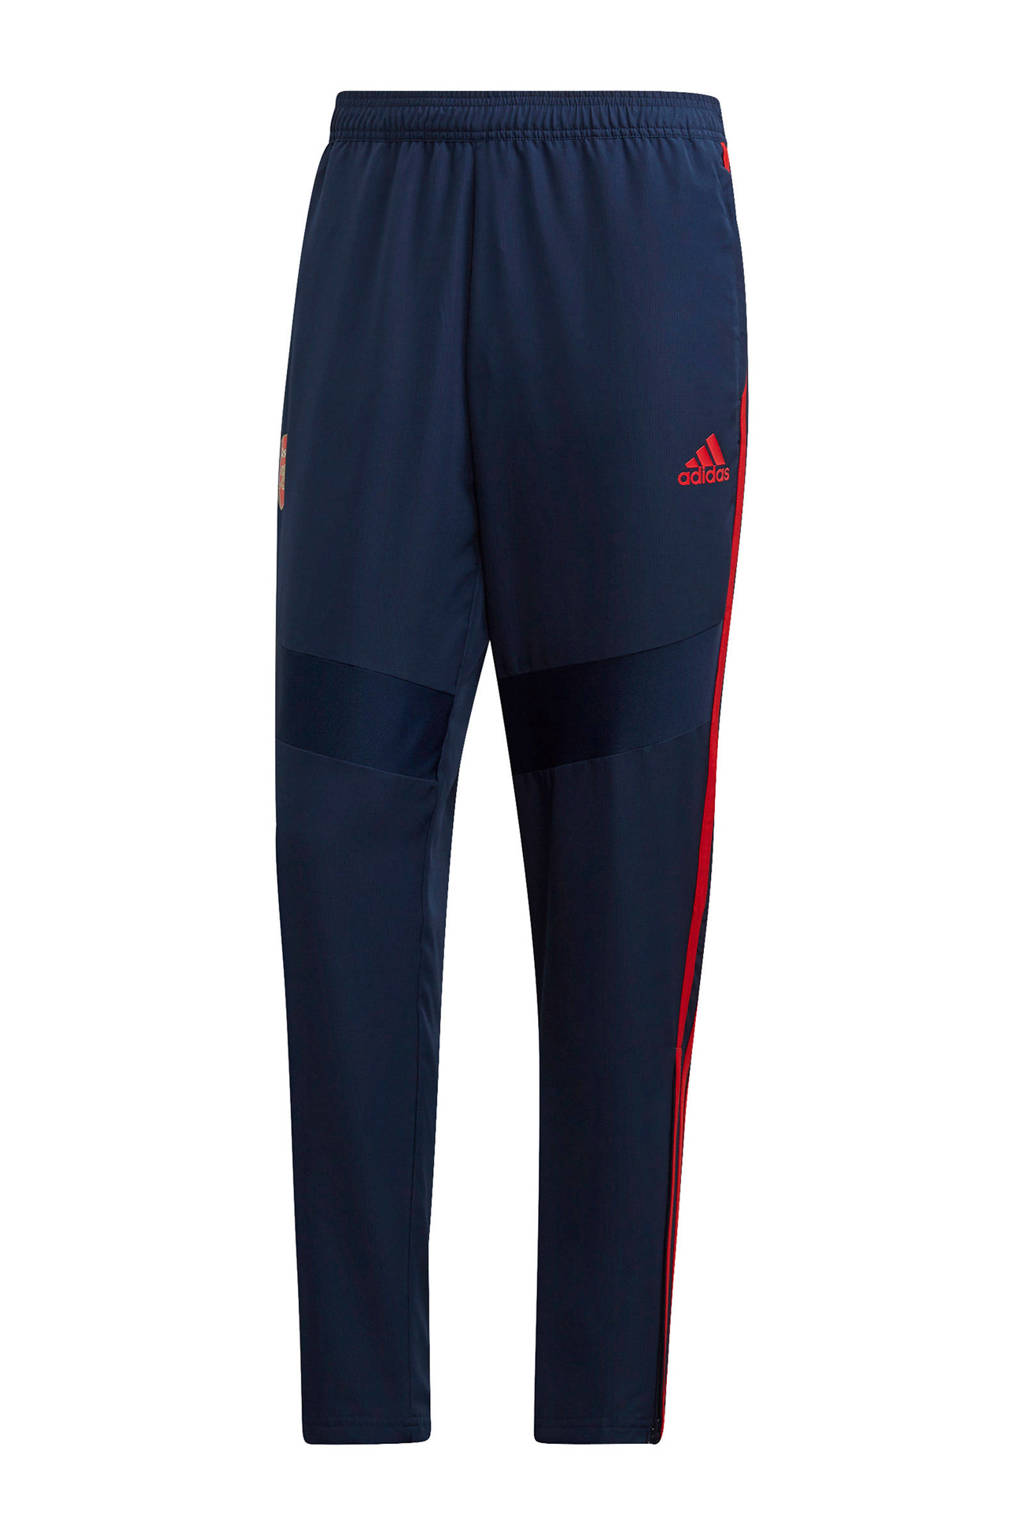 adidas performance Senior Arsenal FC voetbalbroek Presentatie, Donkerblauw/rood